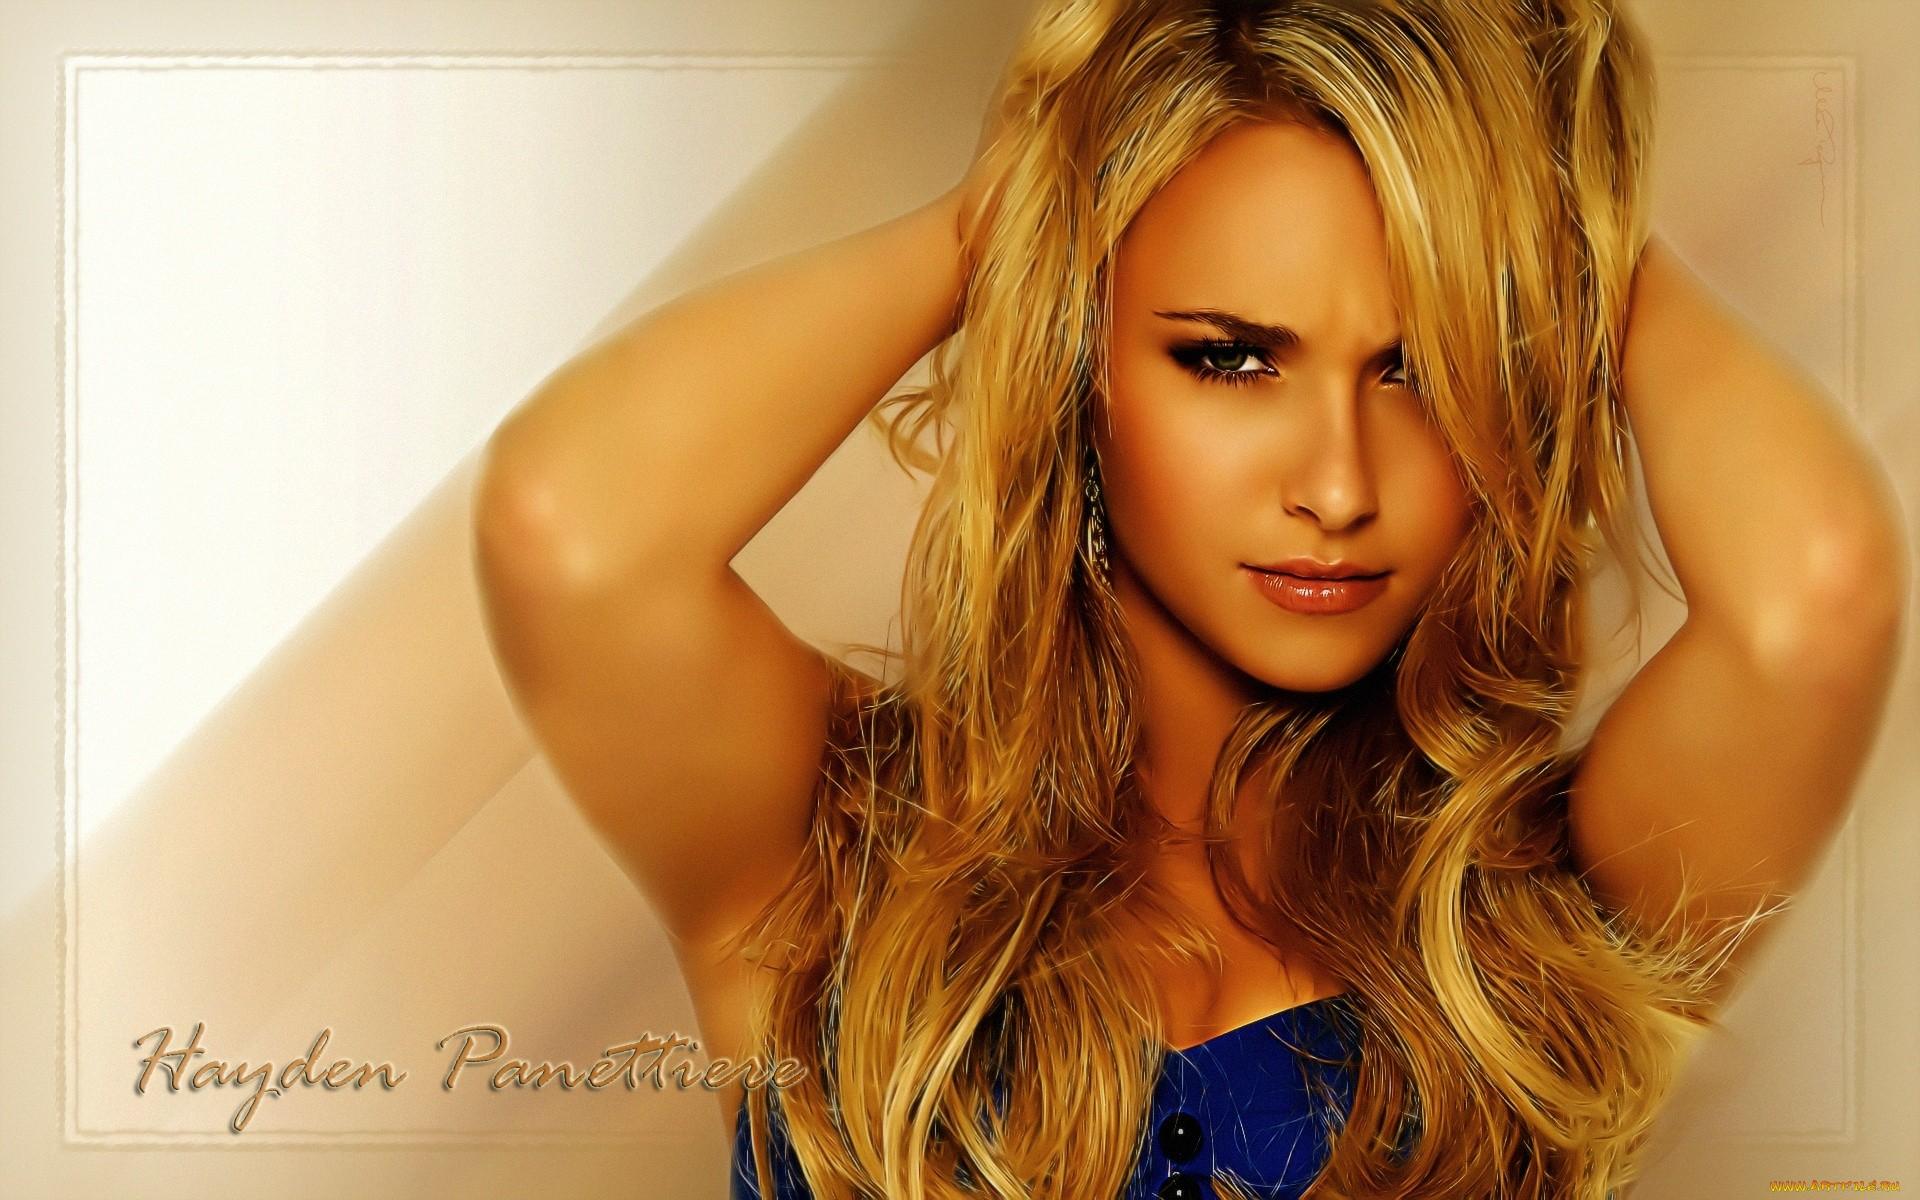 Hayden Panettiere Actresses People Background Wallpapers on